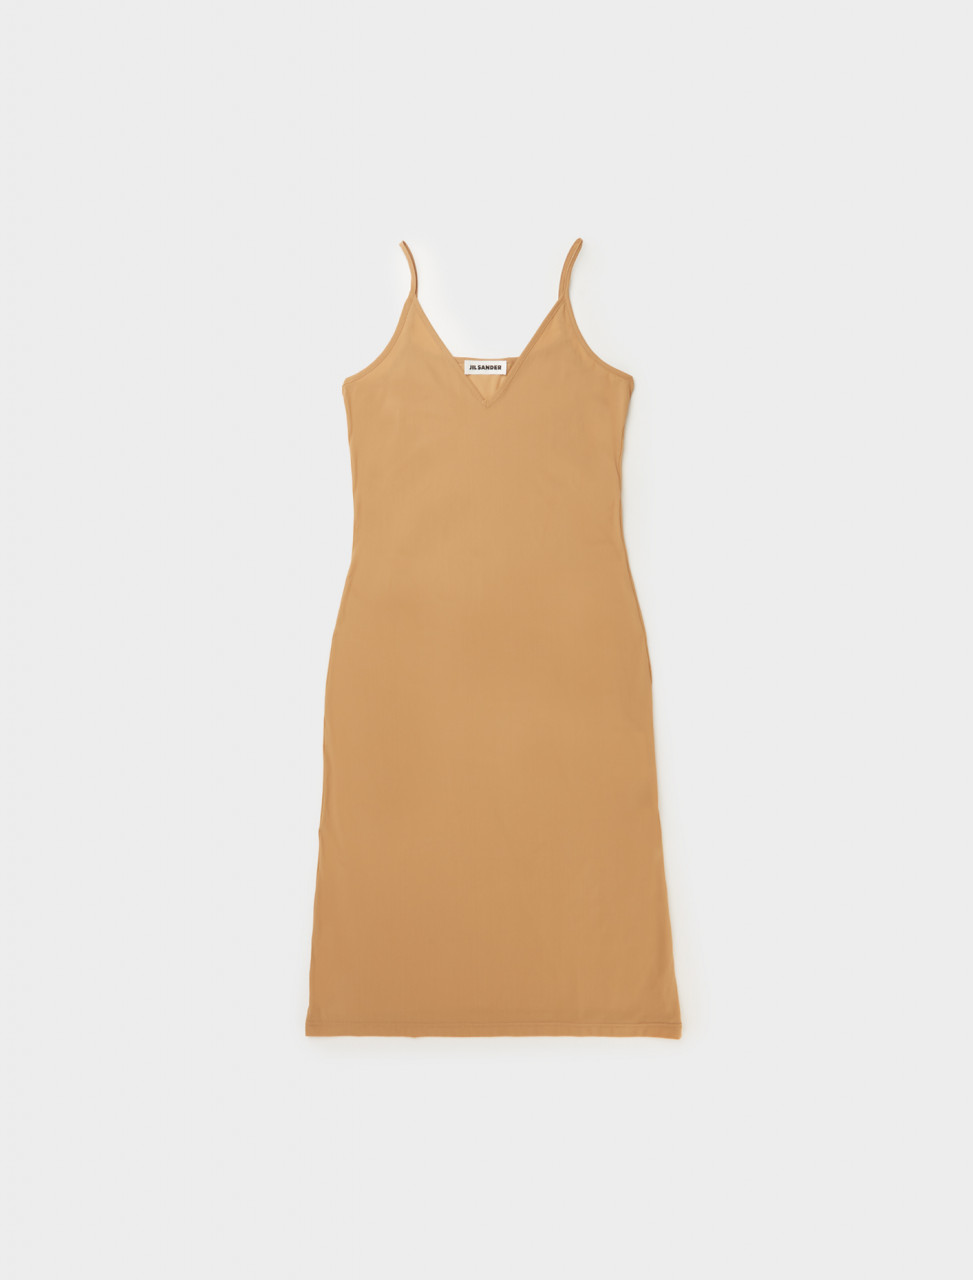 Jil Sander Under-Layer Dress in Beige